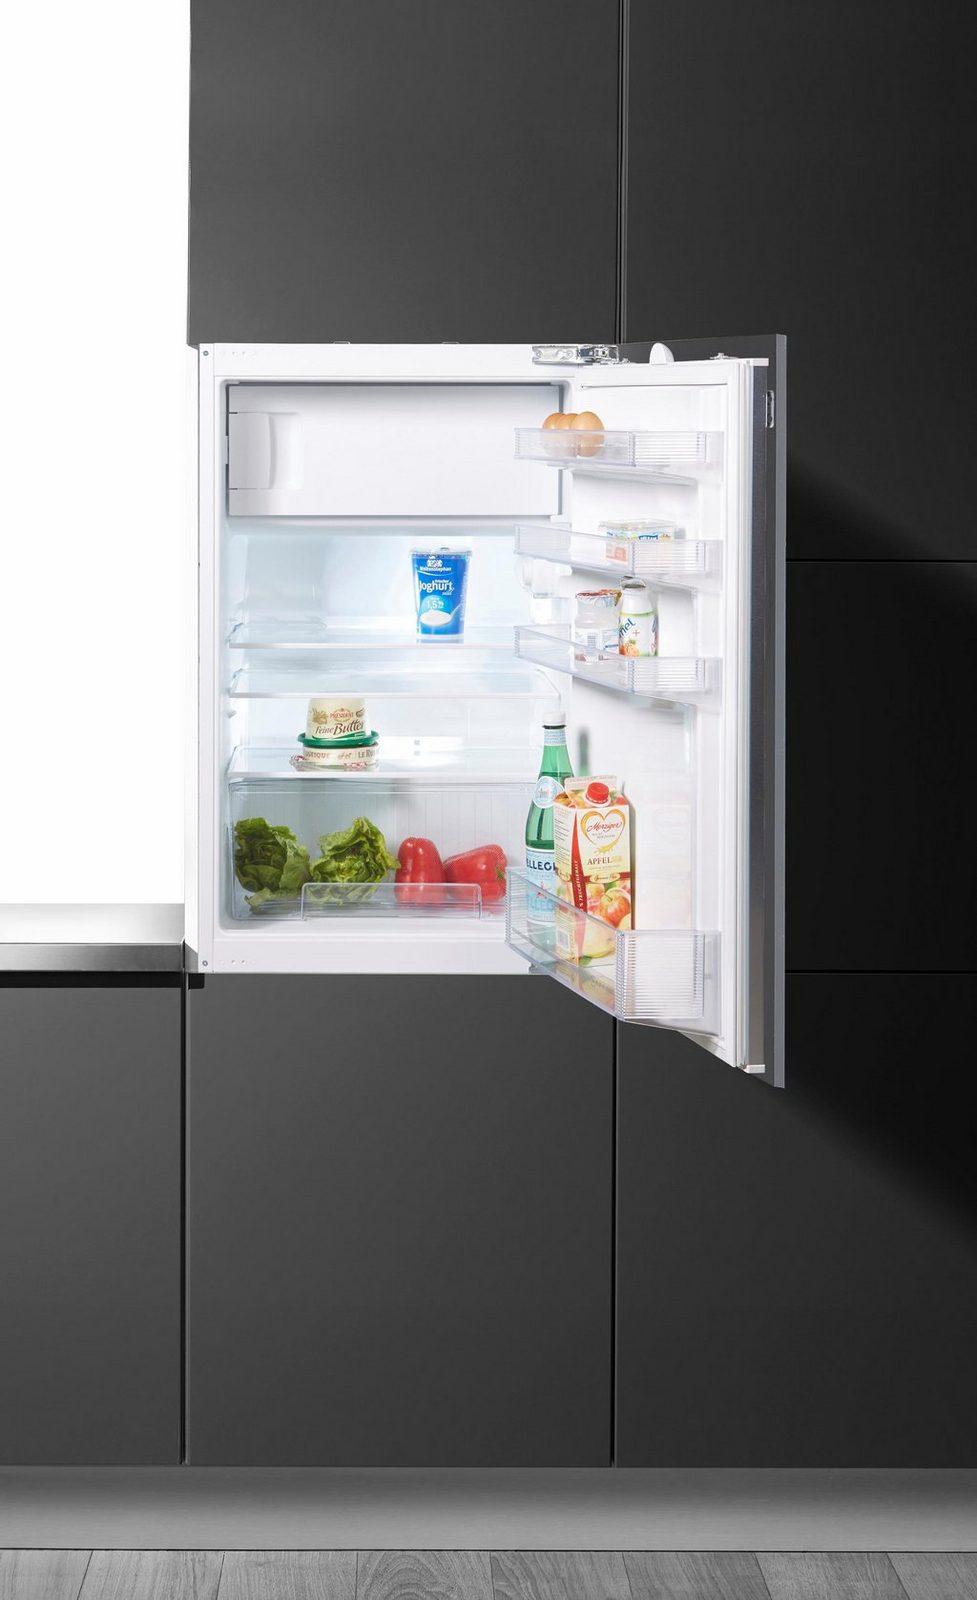 Neff Integrierbarer Einbaukühlschrank K225A2 / K1525X8 jetztbilligerkaufen